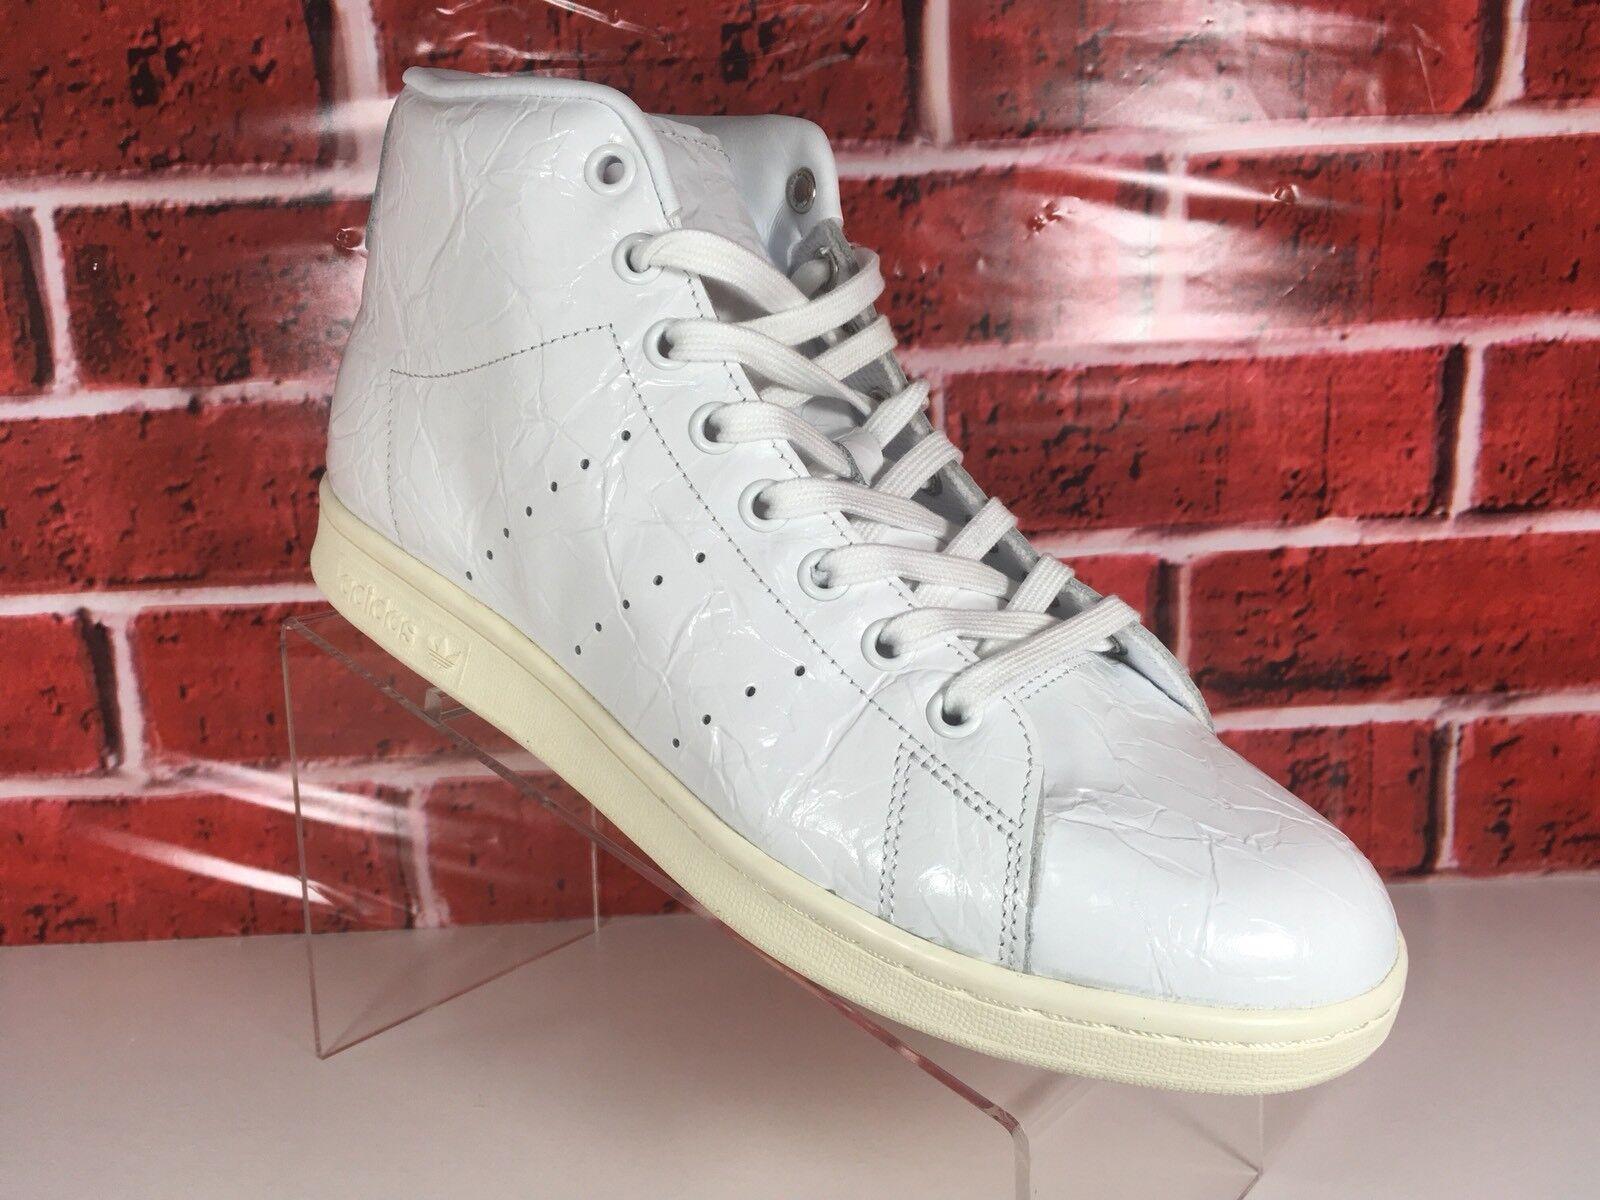 adidas - sneakers leder womens bb0109 stan smith schuhe versandkostenfrei bb0109 womens größe 9. cf0fb6